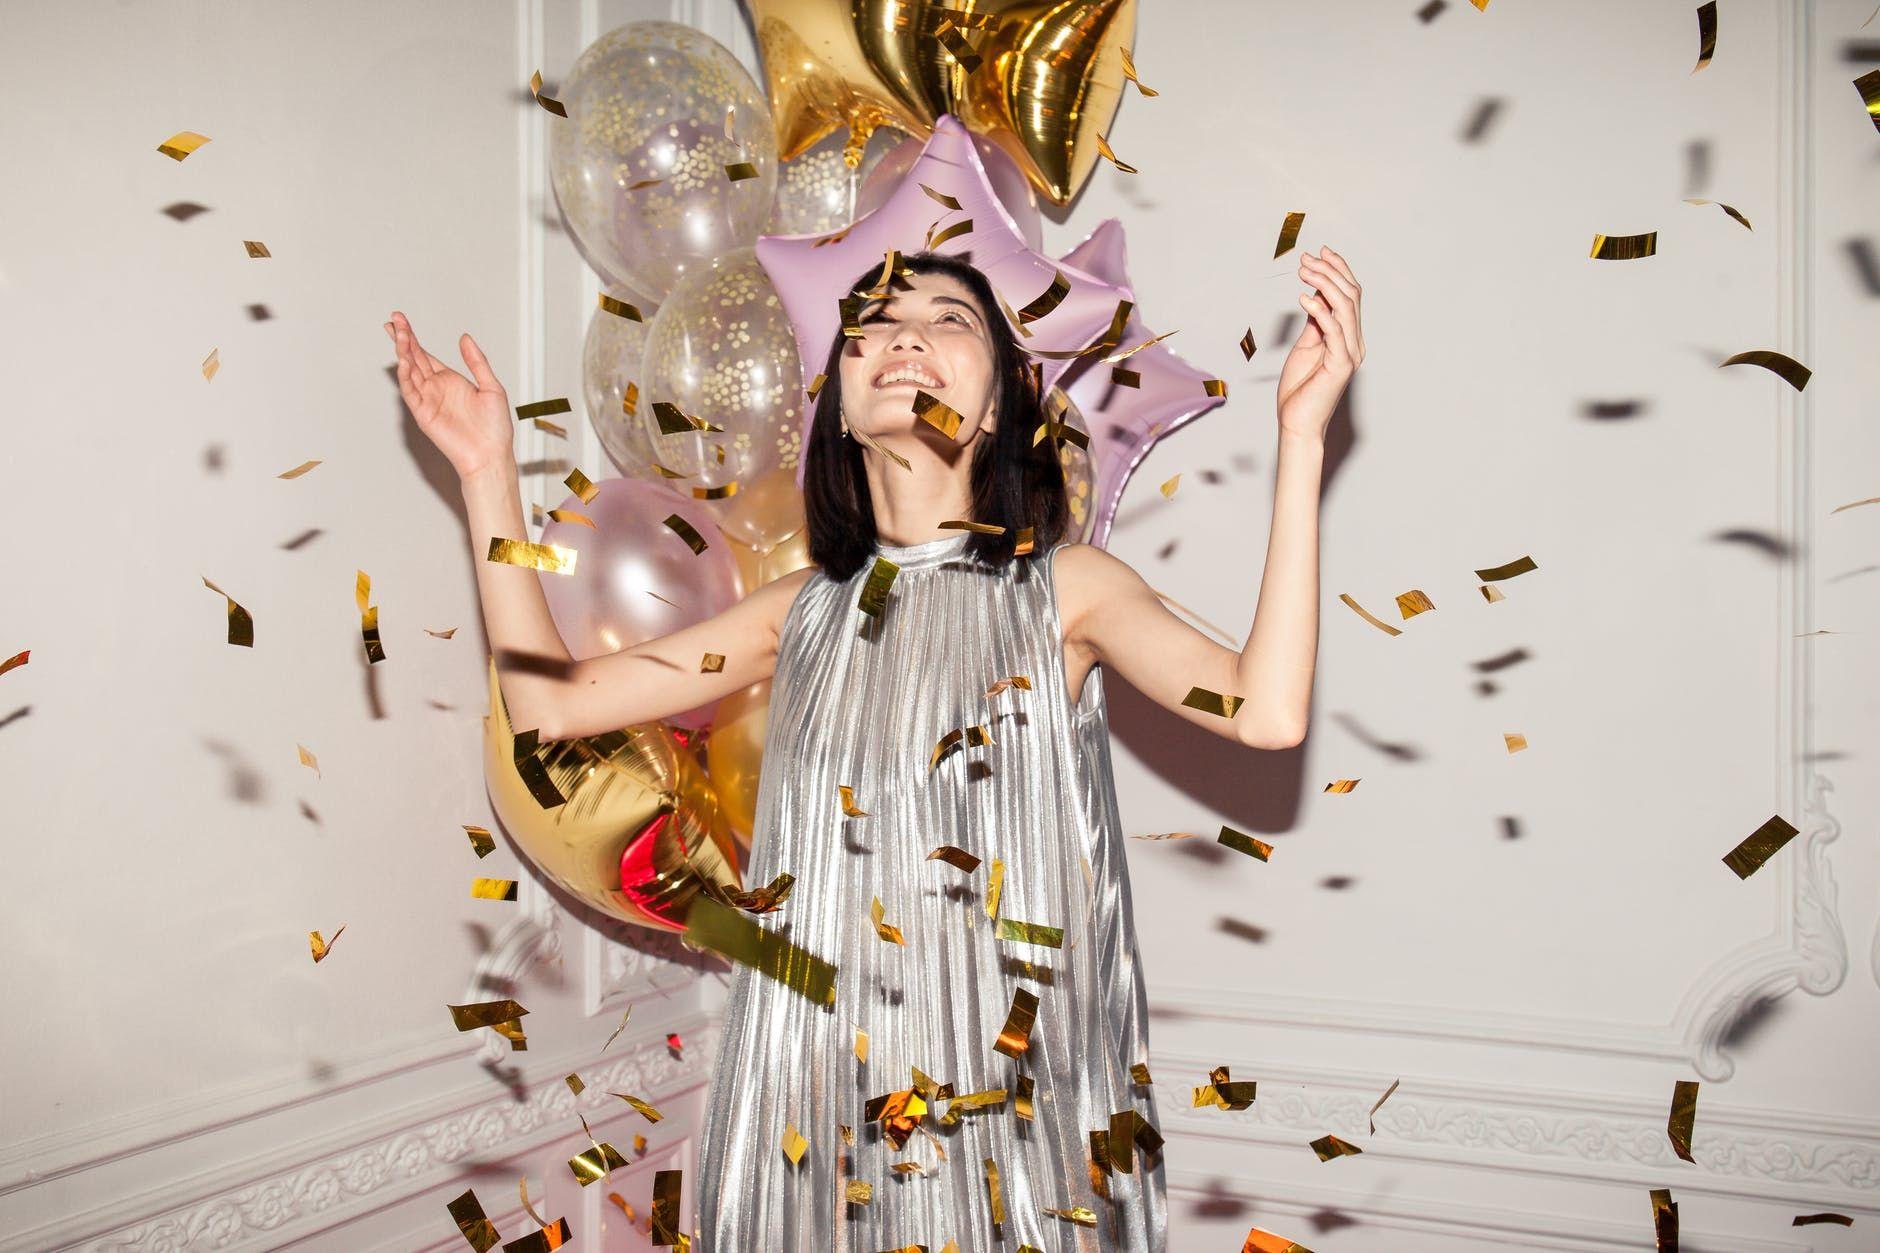 woman looking at falling confetti